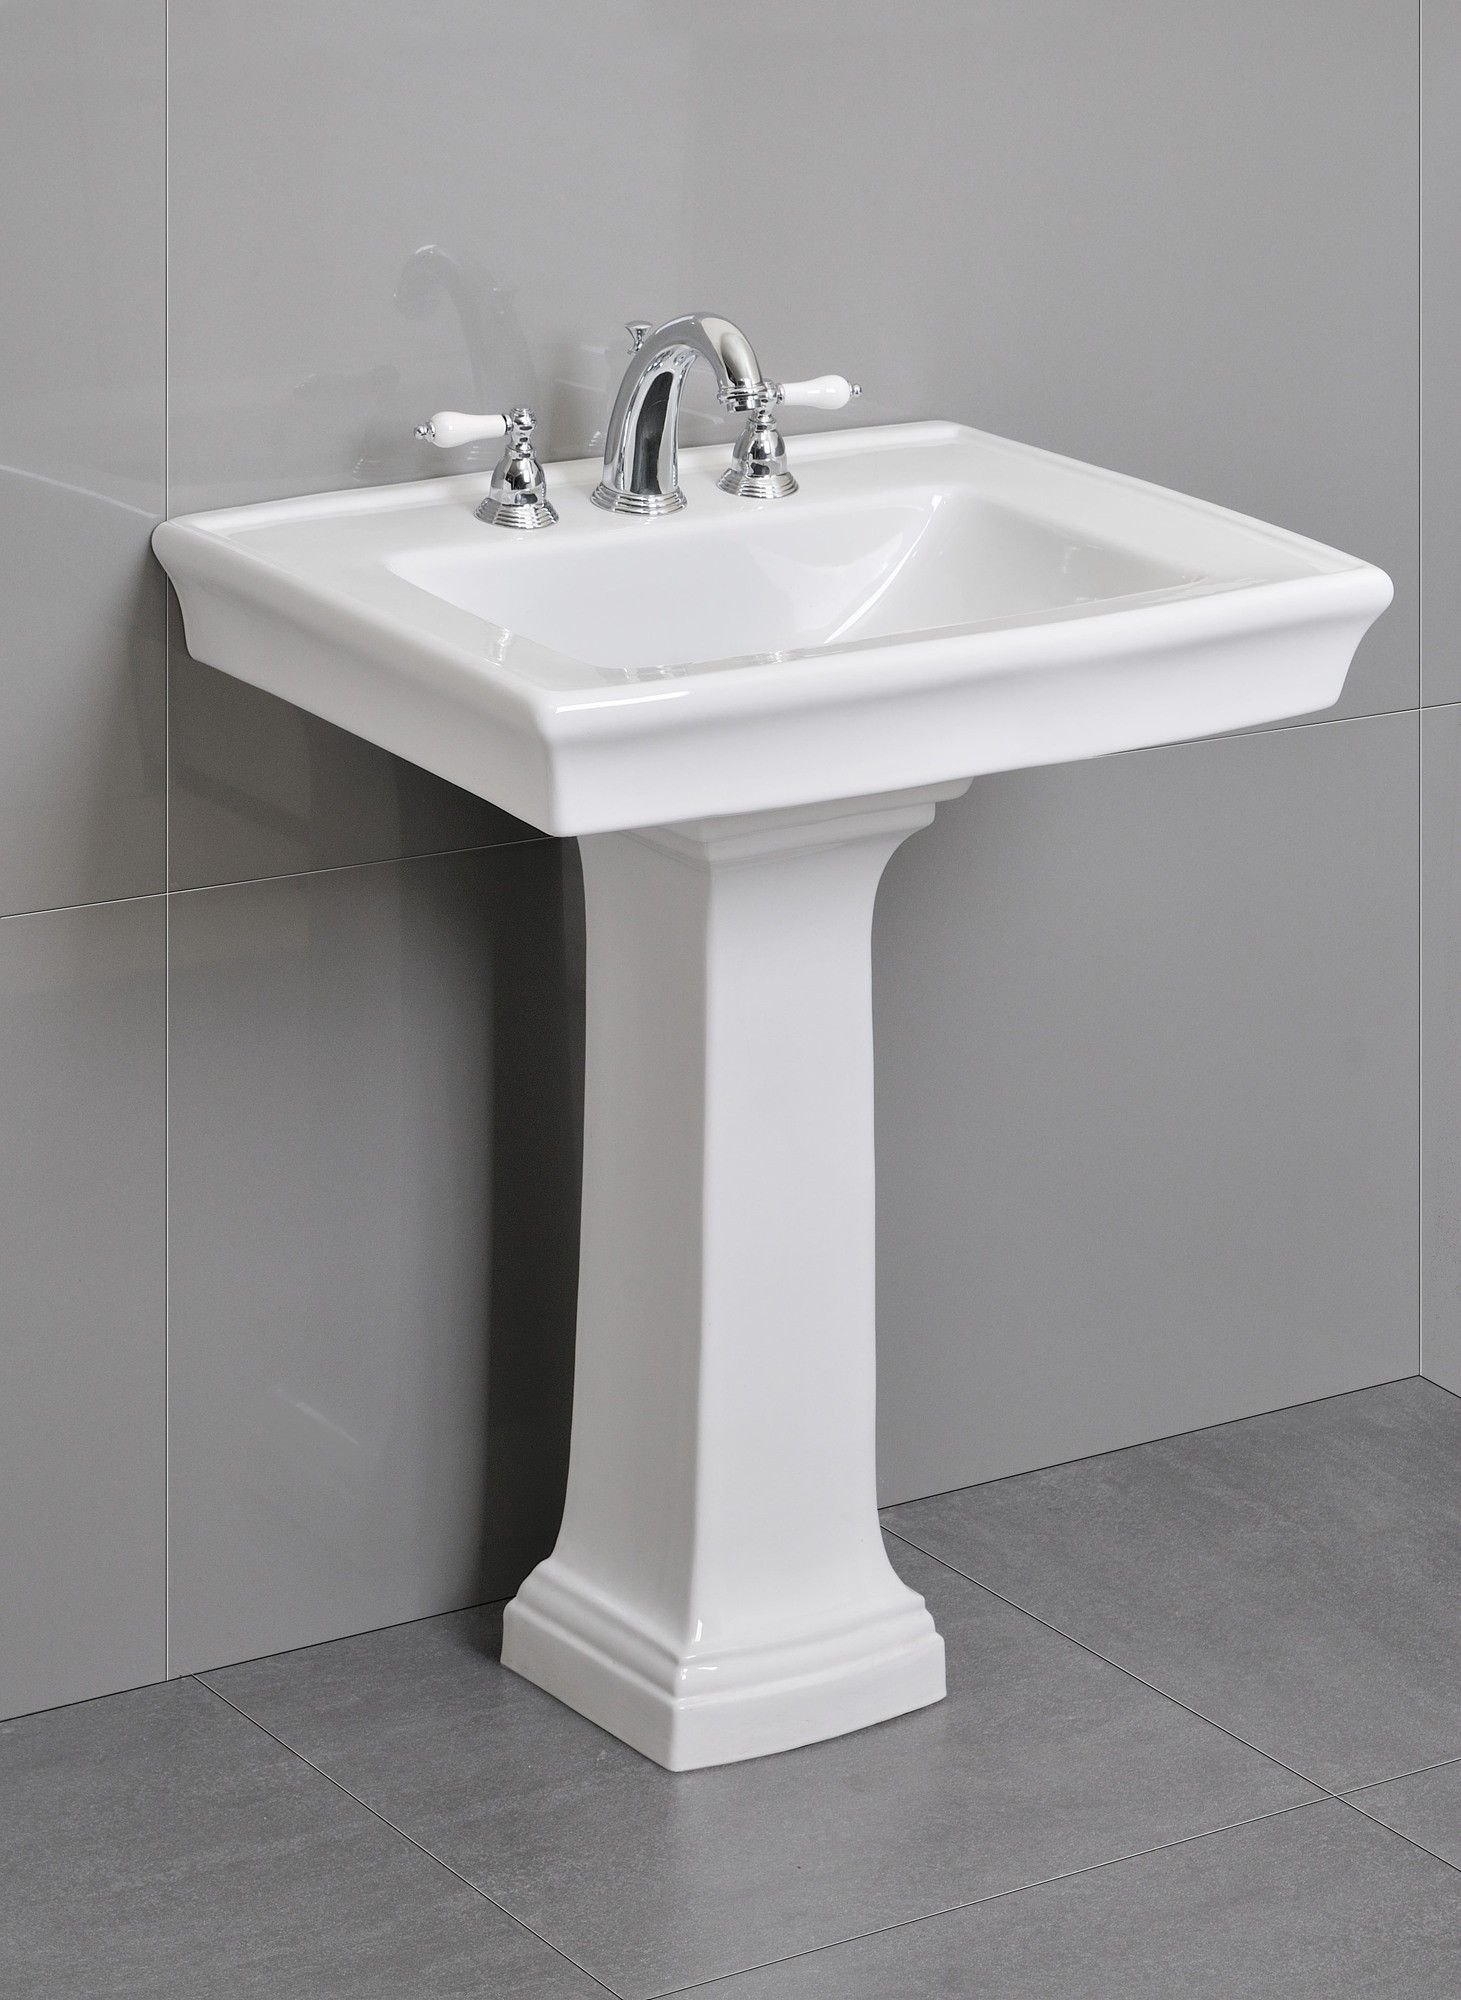 Icera Julian Pedestal Sink Lp 2320 100 Bathroom Ideas